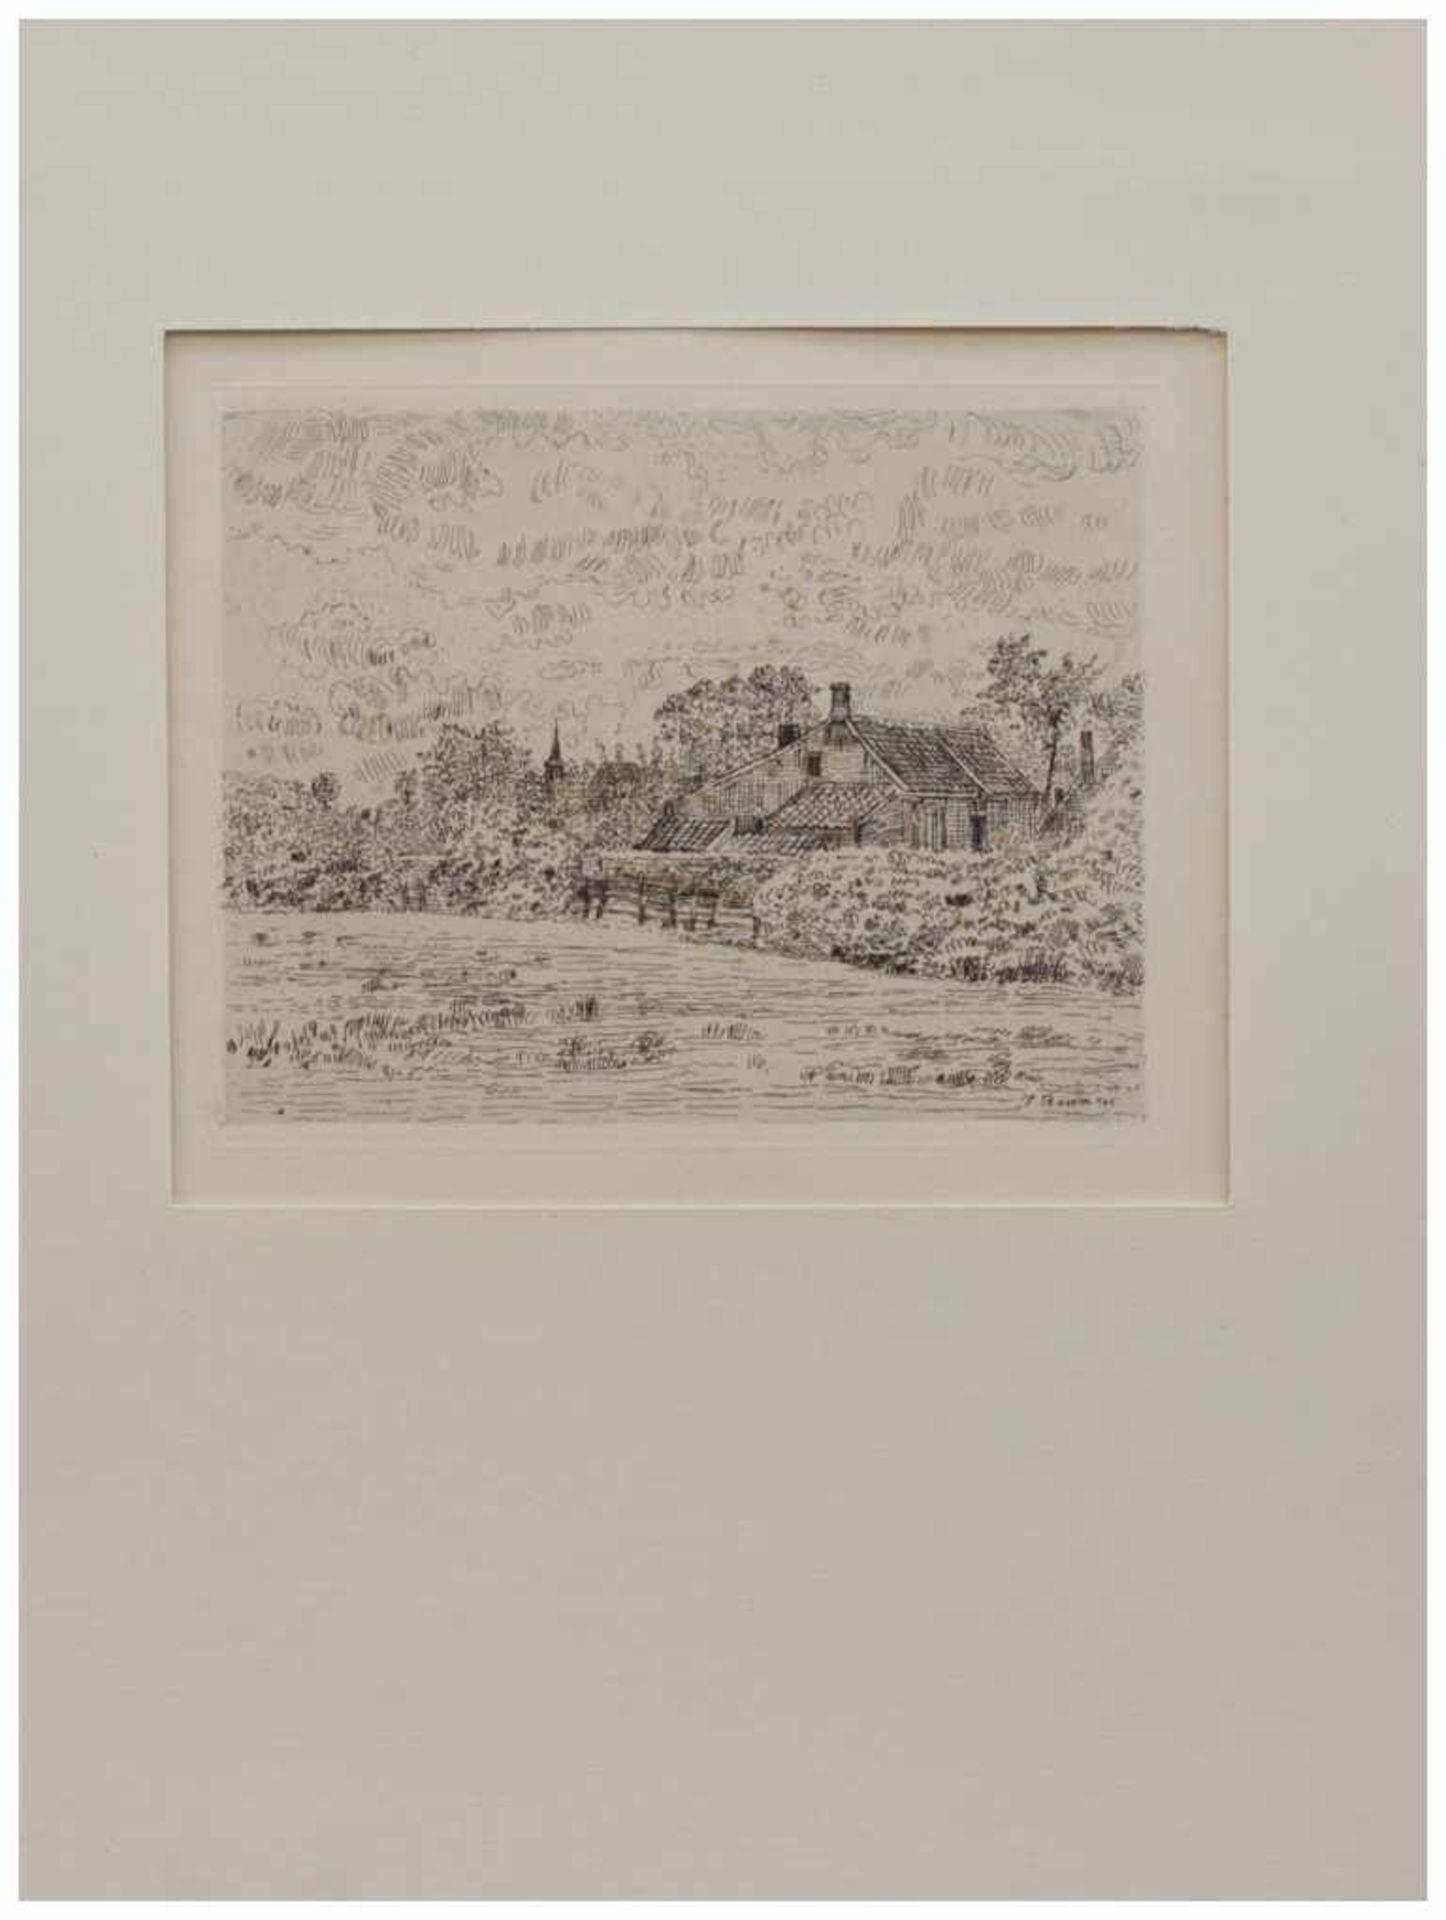 Los 18 - Paul Baum (Meissen 1859 - 1932 San Gimignano, deutscher Landschaftsmaler u. Grafiker, Std. a.d.